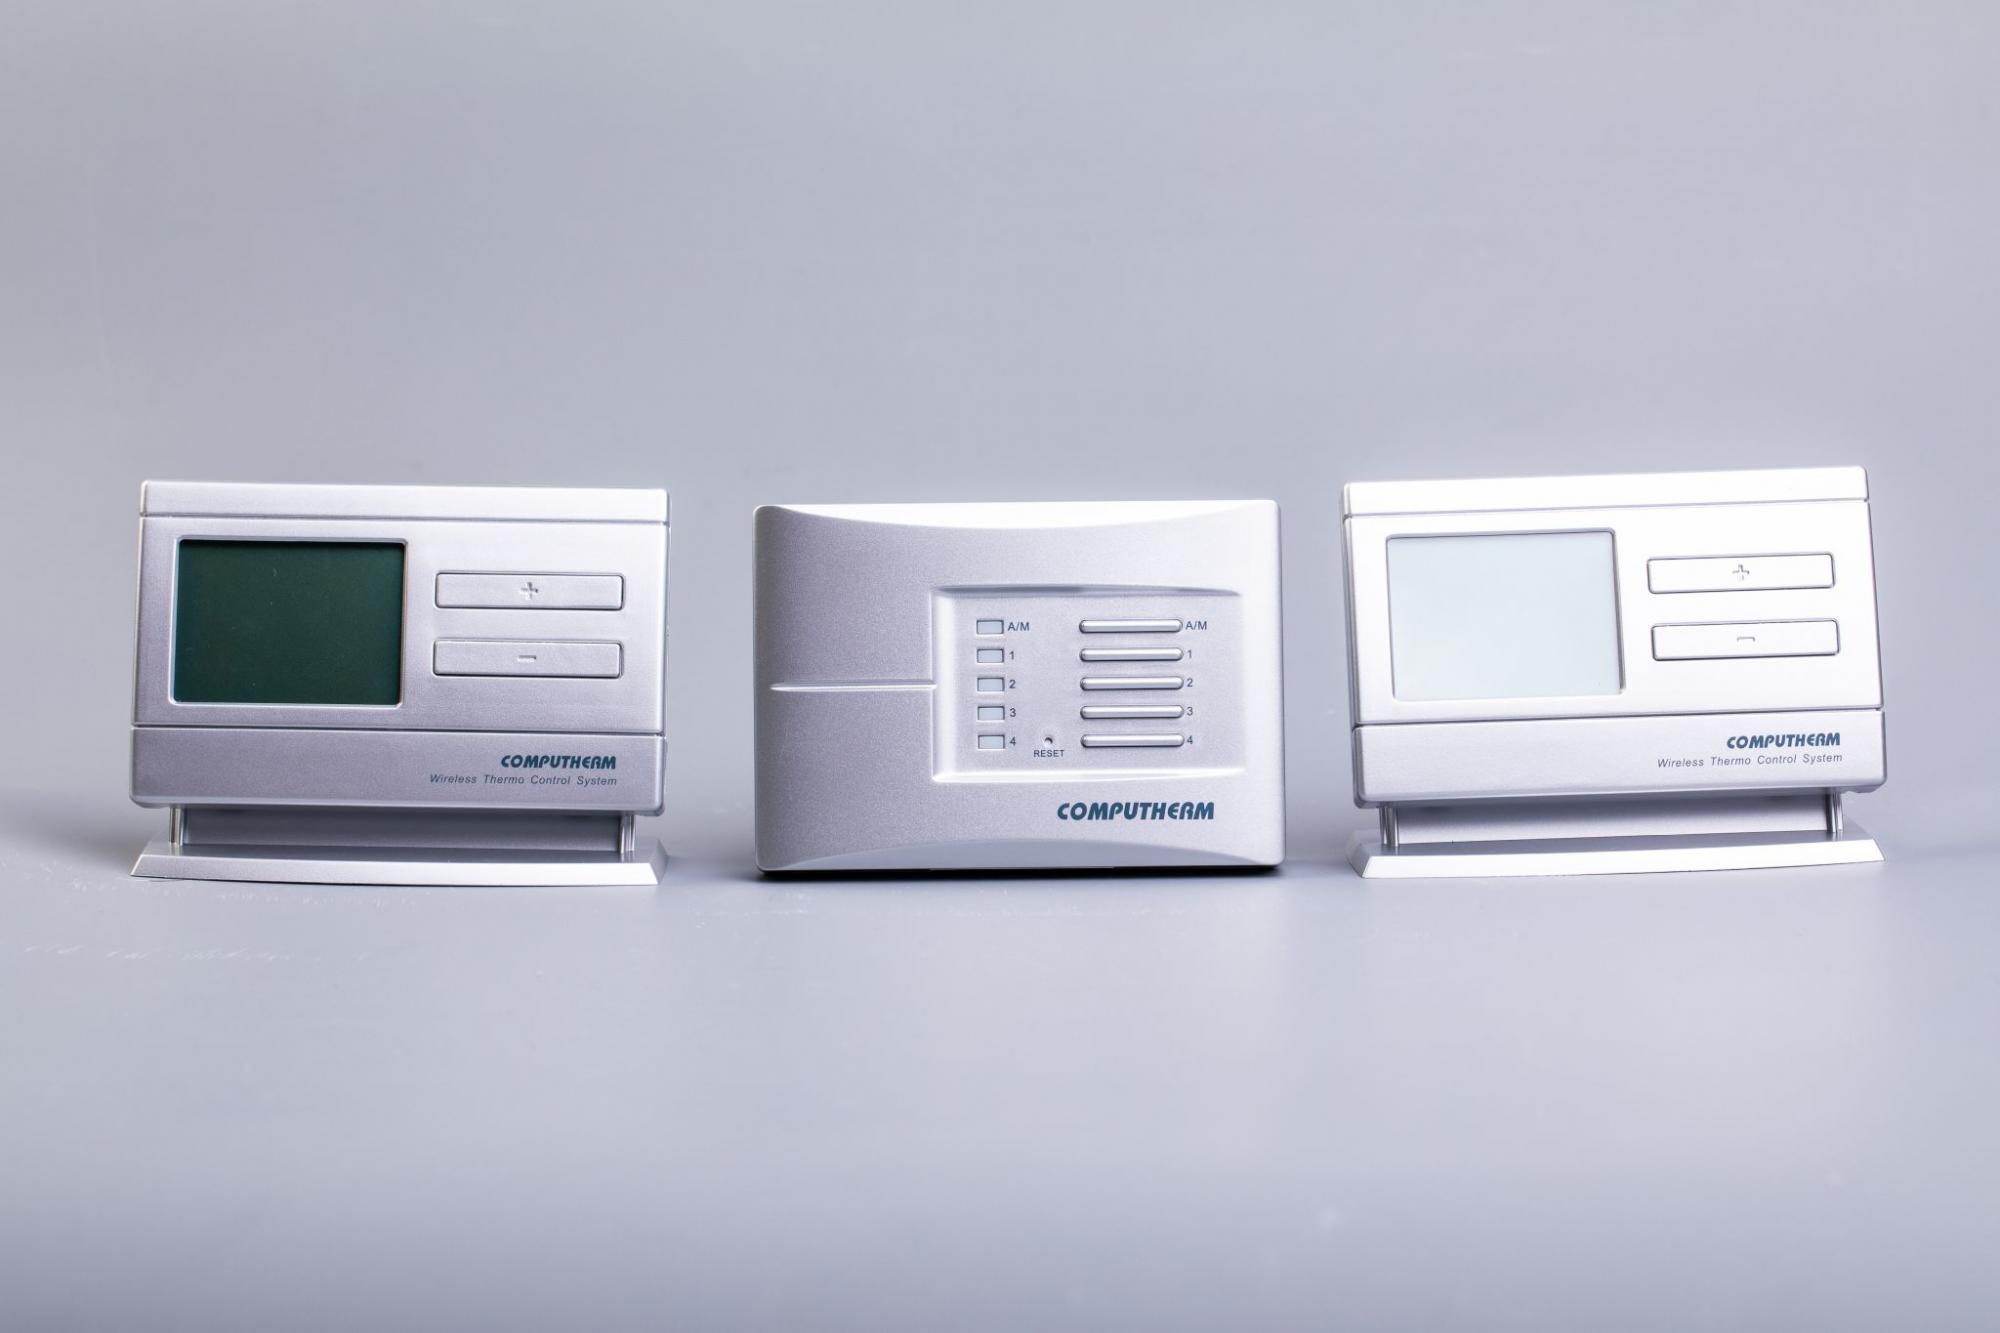 Computherm - Digitális termosztátok -  COMPUTHERM Q8RF - Quantrax Kft.